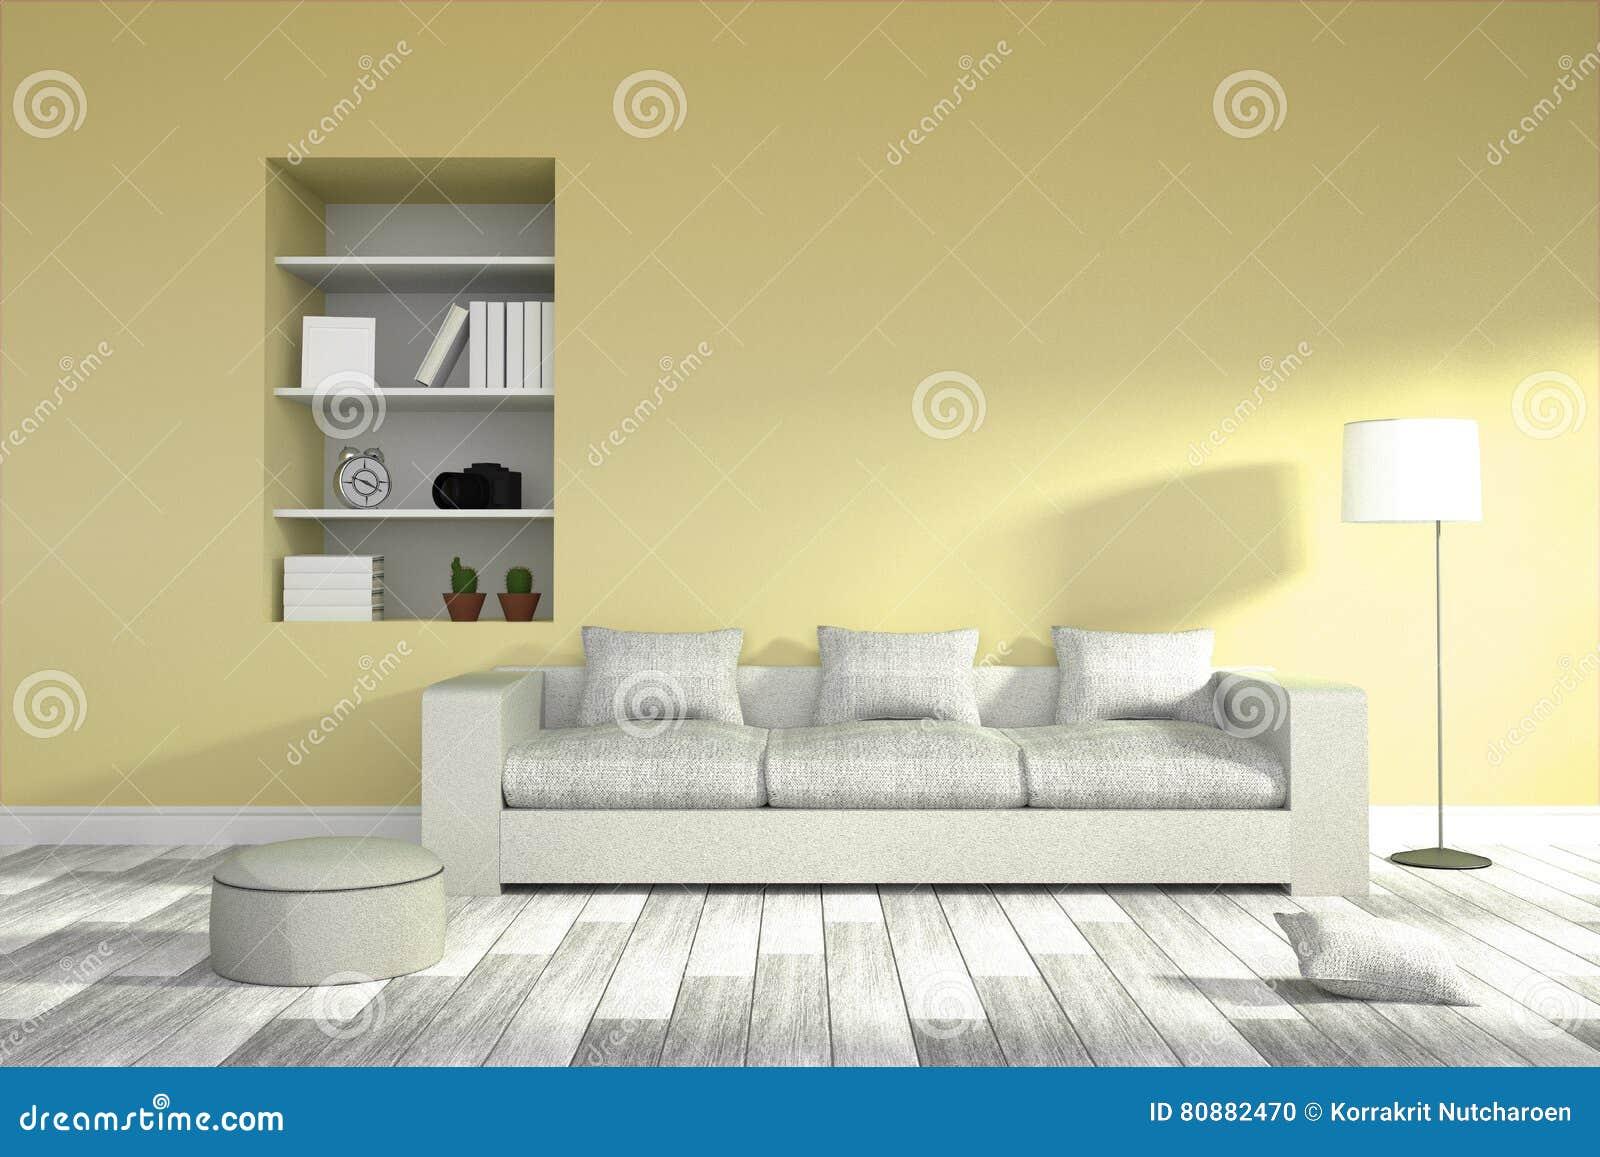 Incredible 3D Rendering Illustration Of Modern Living Room Interior Pdpeps Interior Chair Design Pdpepsorg